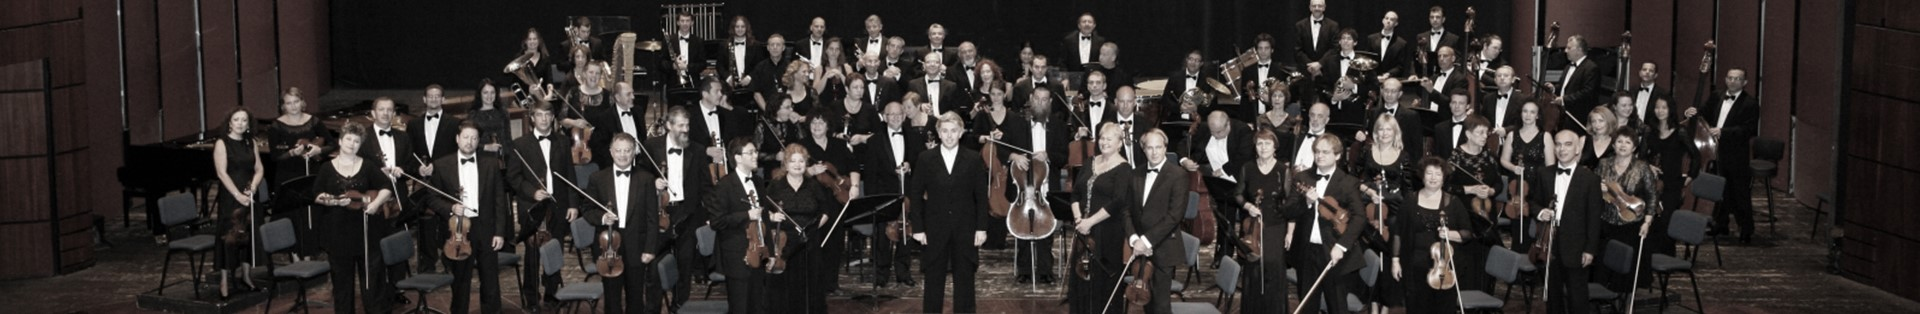 The Israel symphony orchestra Rishon Lezion